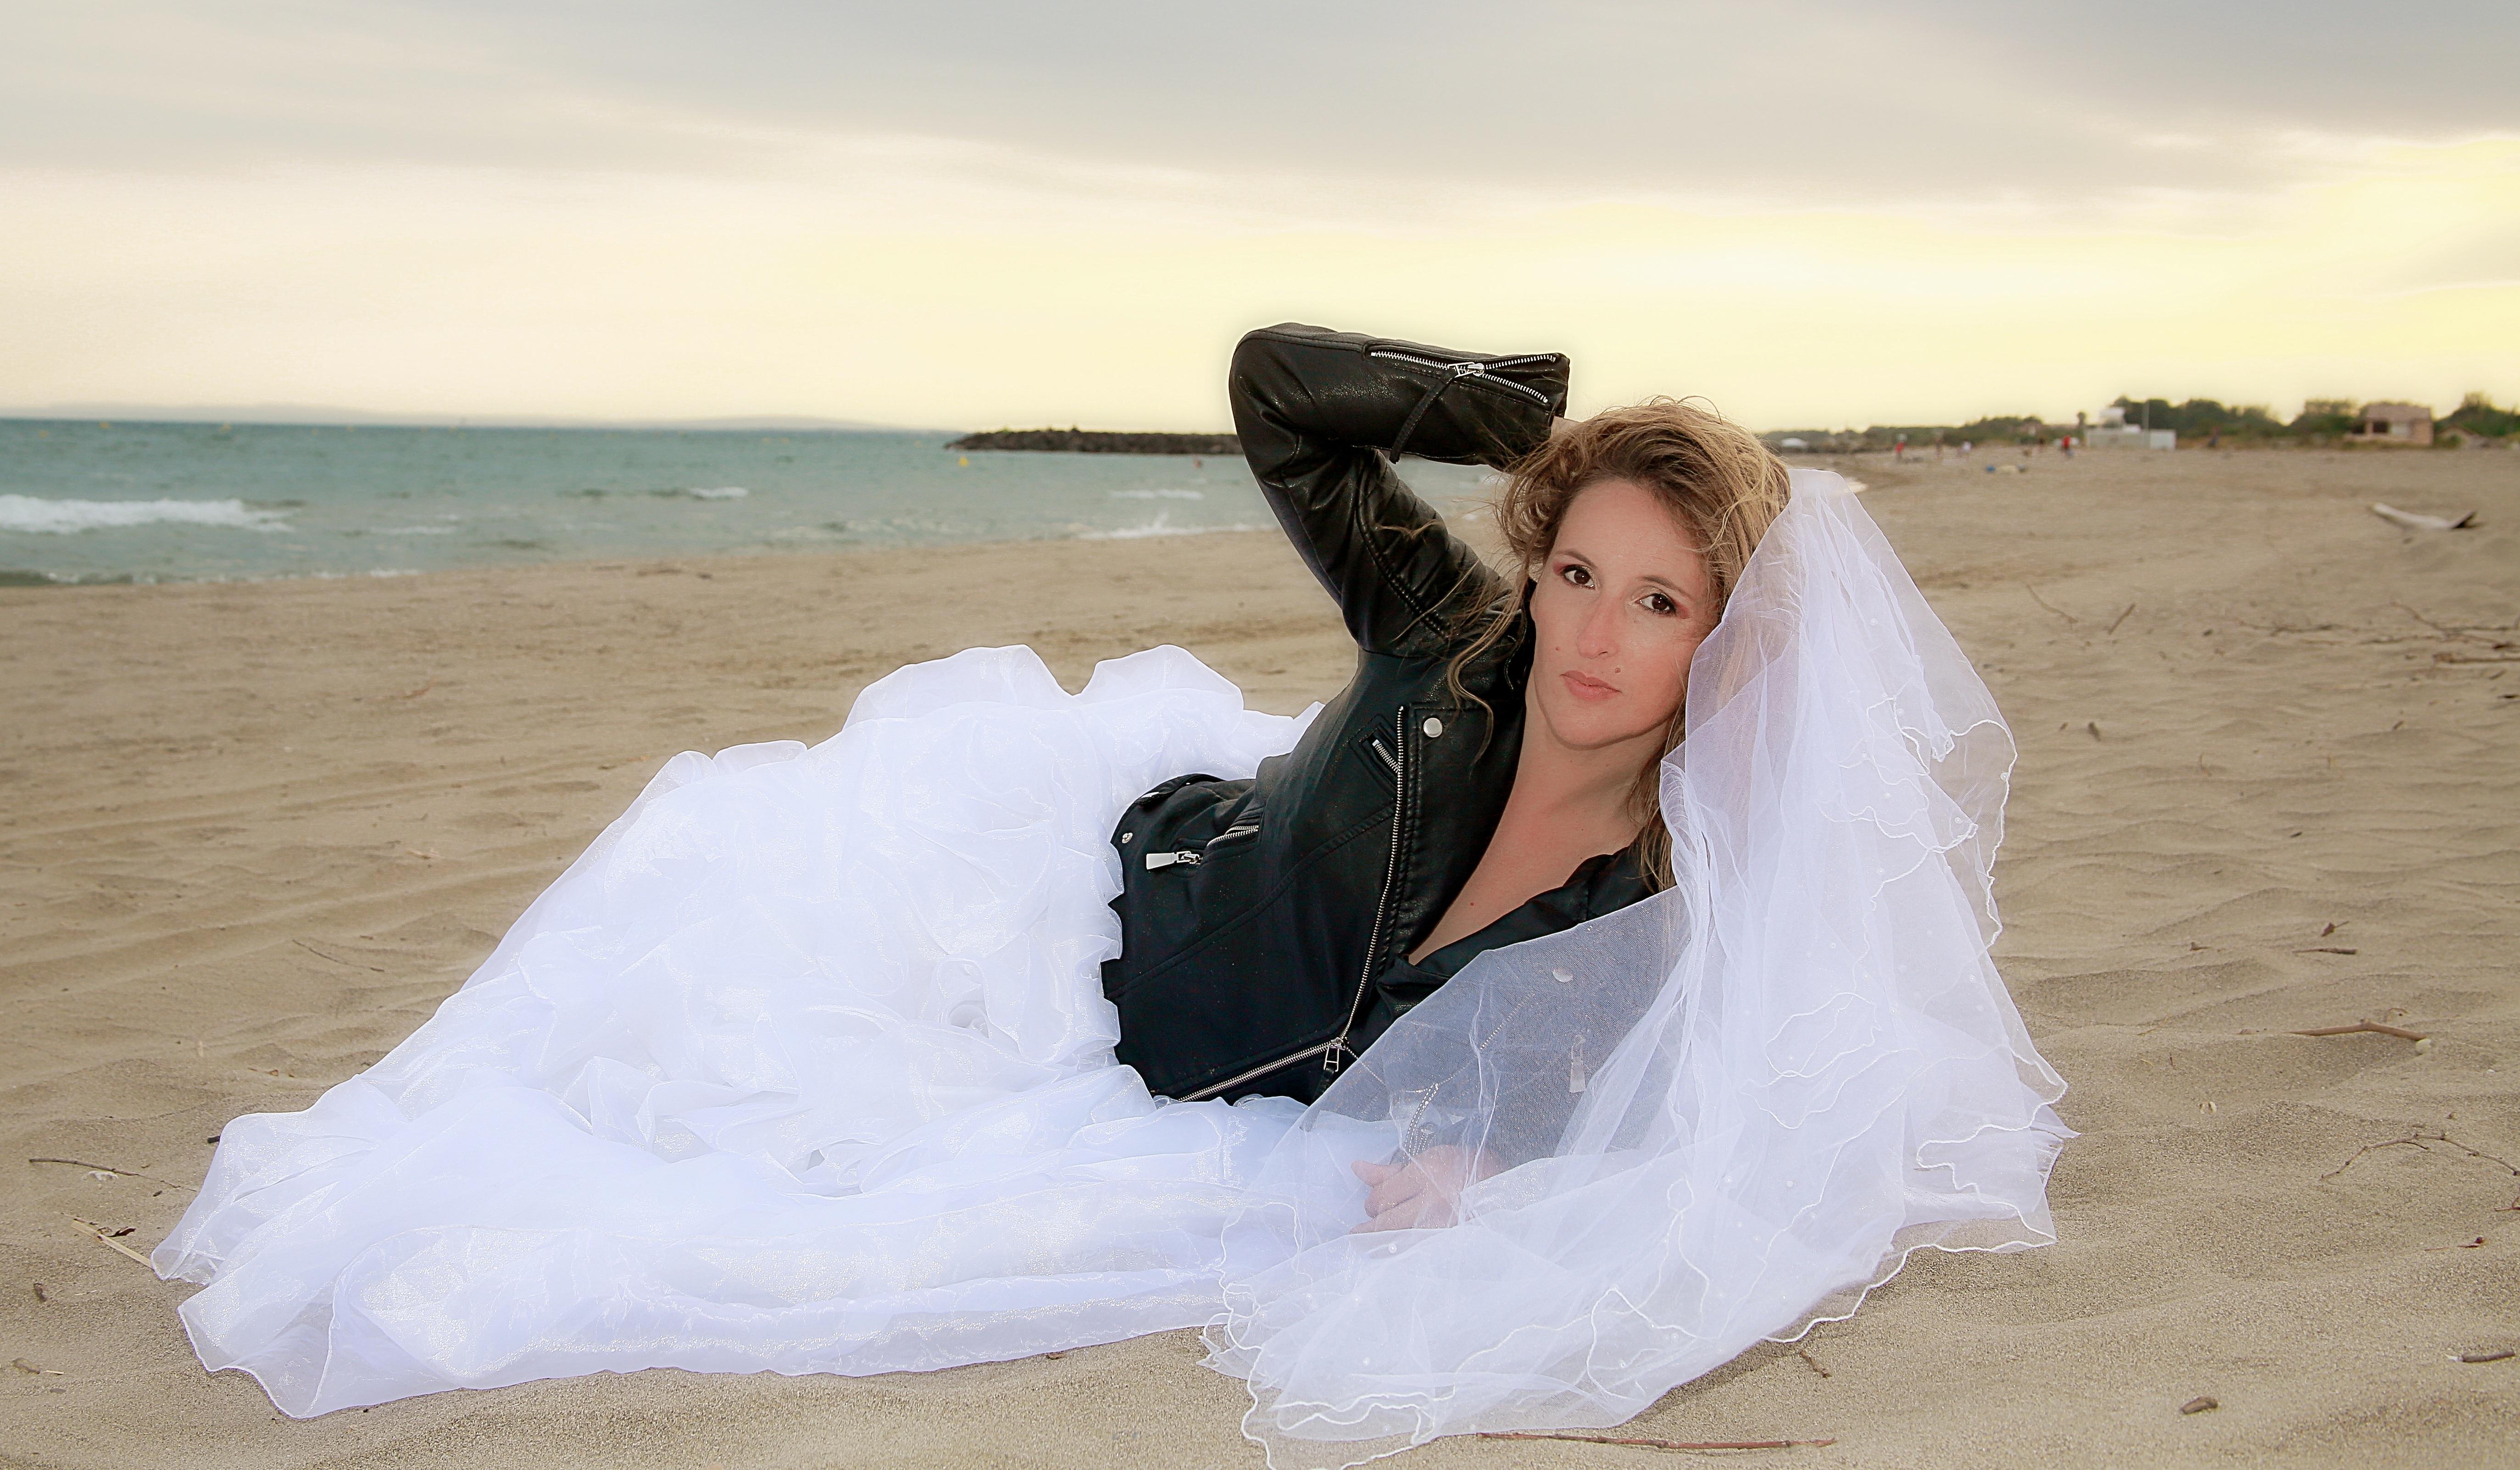 2c039a911 playa paisaje mar arena niña mujer blanco modelo romance Moda ropa Boda  vestido de novia novia